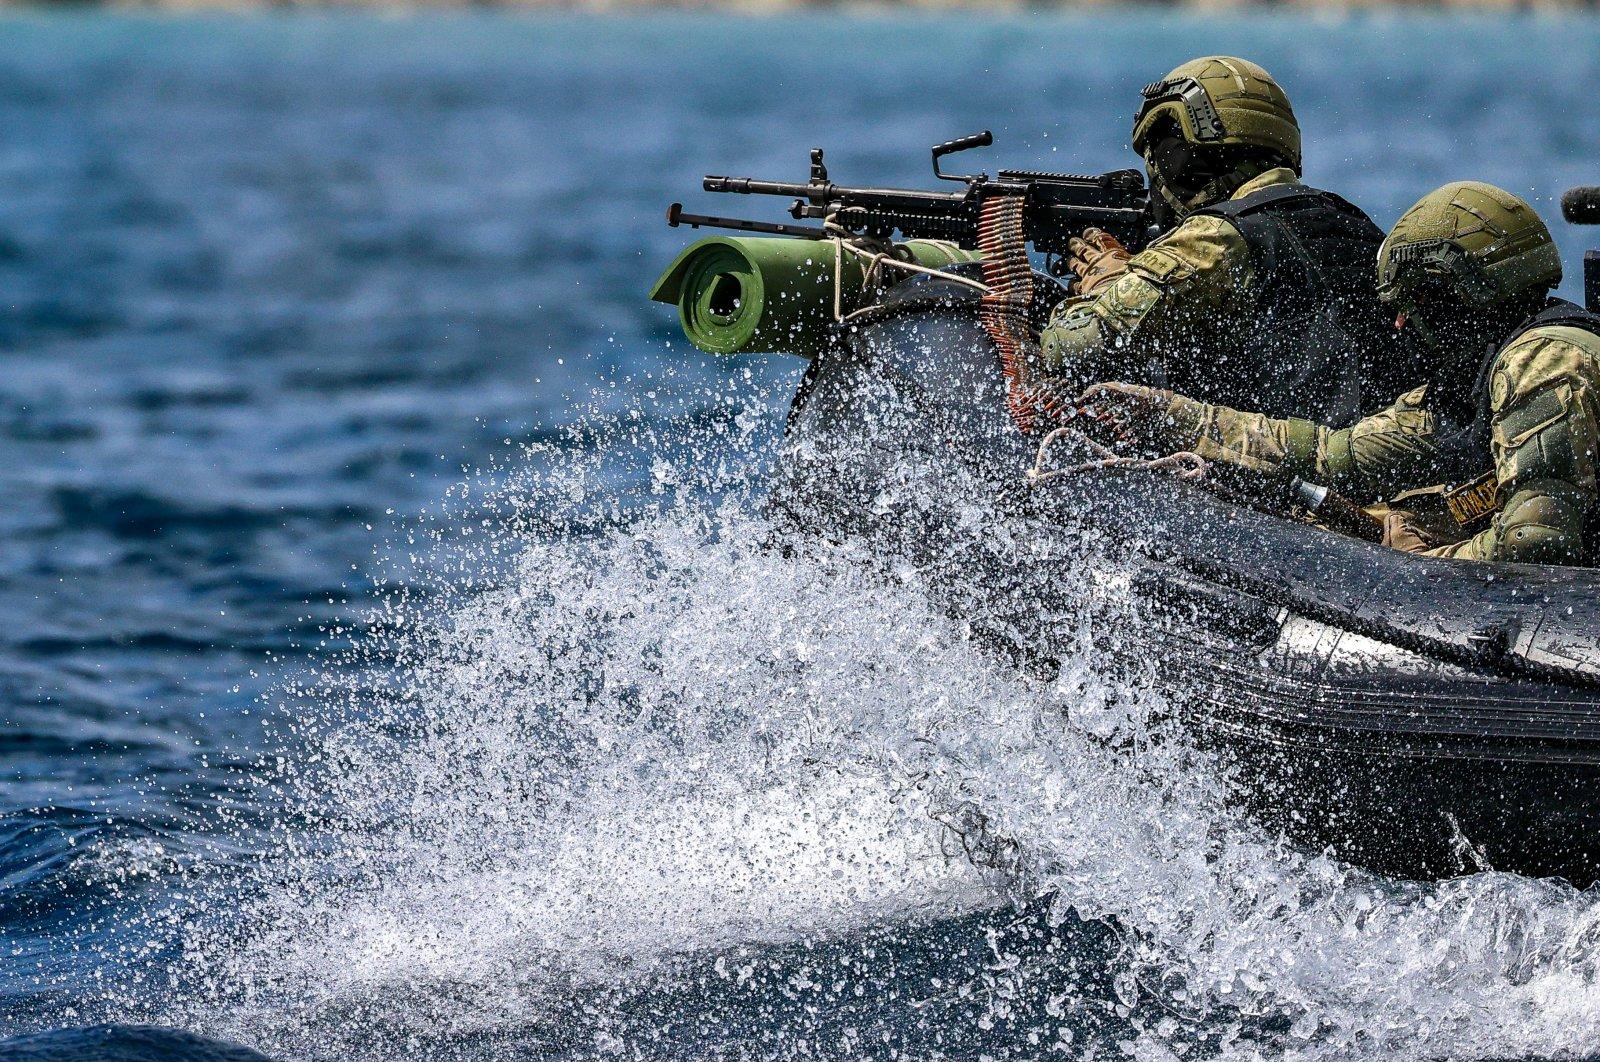 Soldiers approach a vessel aboard a boat, in Izmir, western Turkey, April 29, 2021. (AA PHOTO)